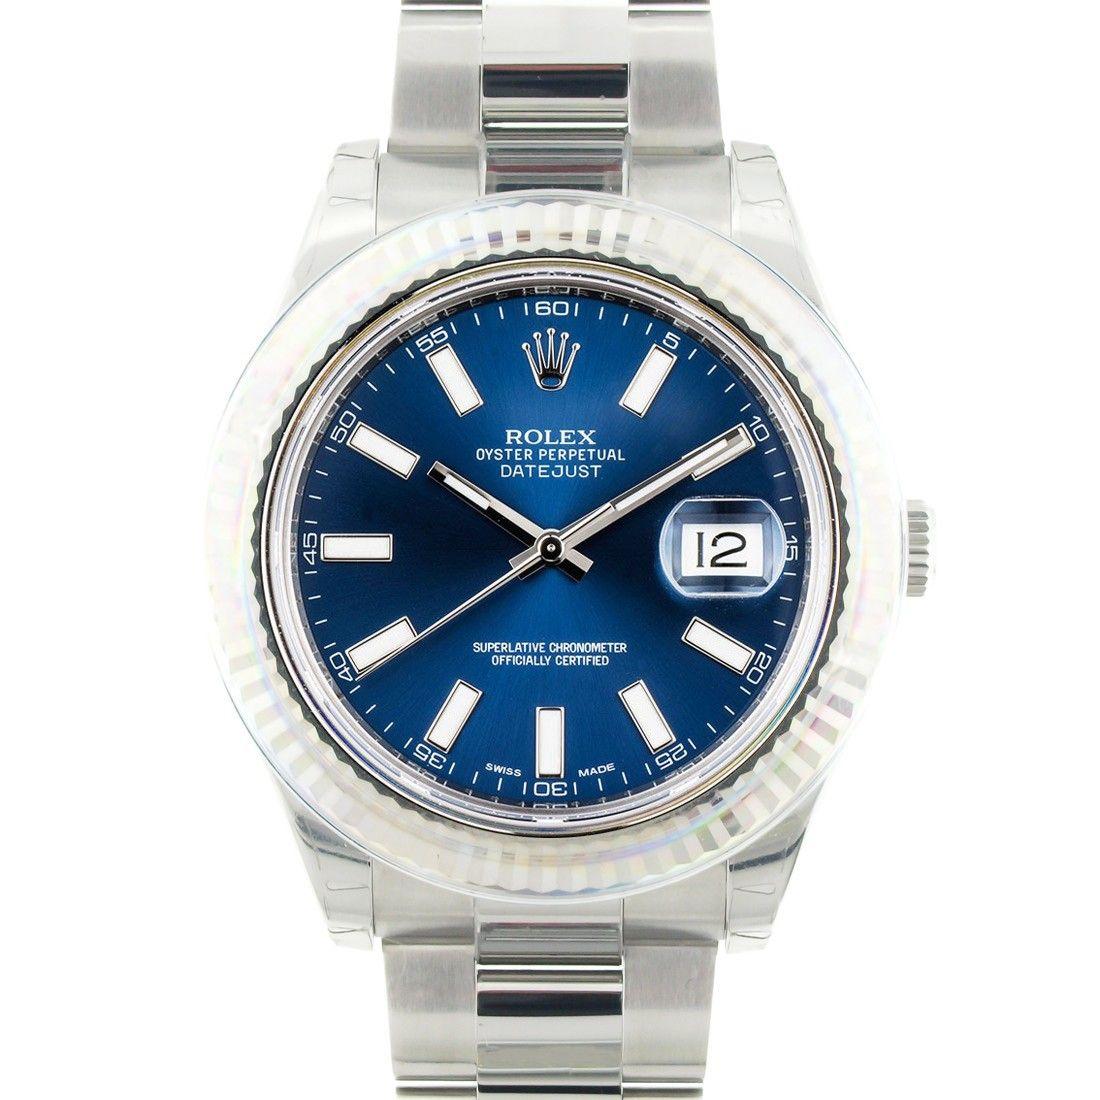 Rolex Datejust Blue Dial 41mm